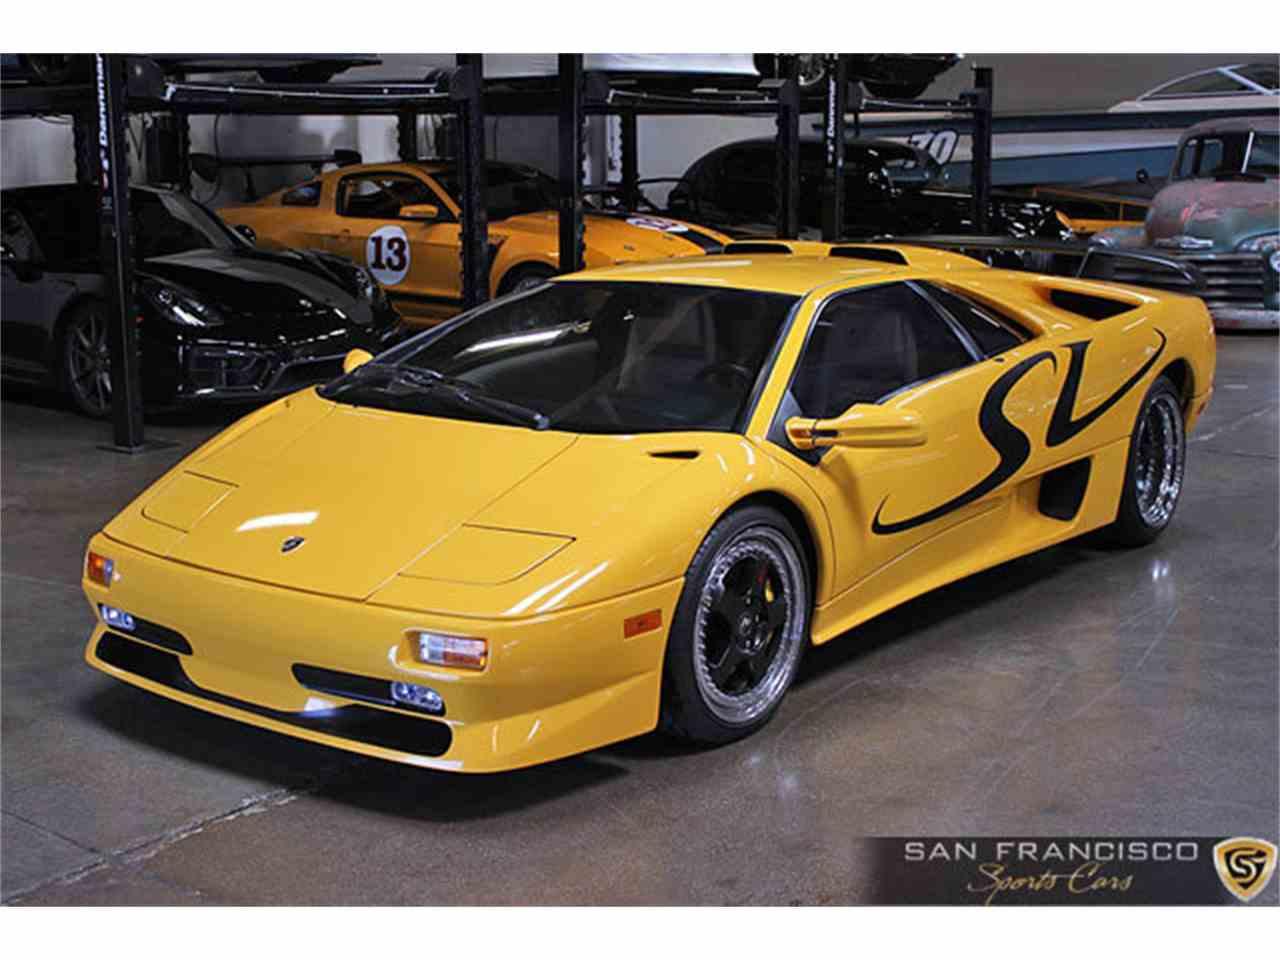 Large Picture of '98 Lamborghini Diablo located in California - $299,995.00 - LSEE